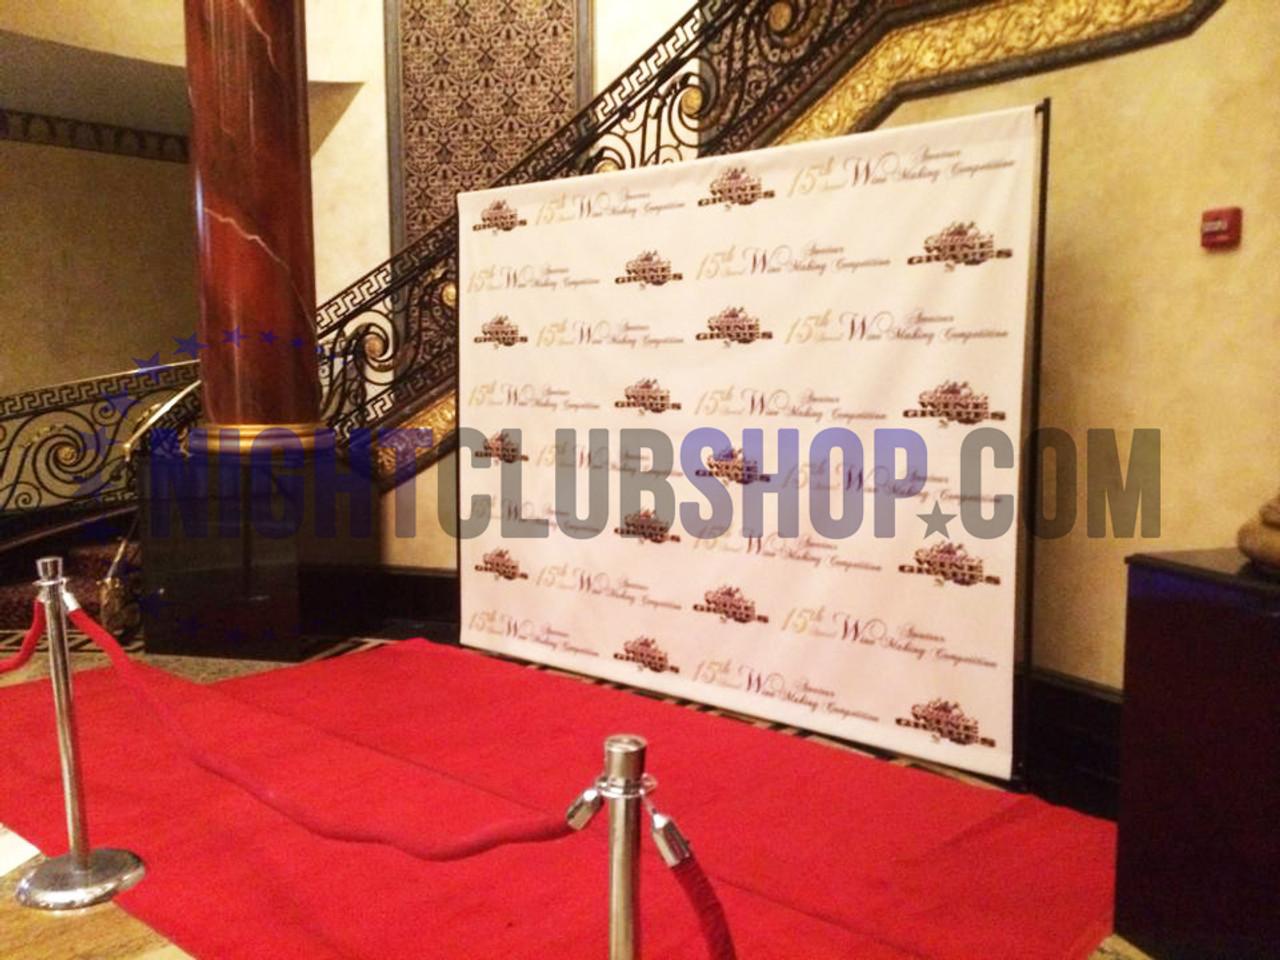 10' X 10' STEP & REPEAT BACK DROP NO GLARE MATTE - VIP Red Carpet NIGHTCLUB